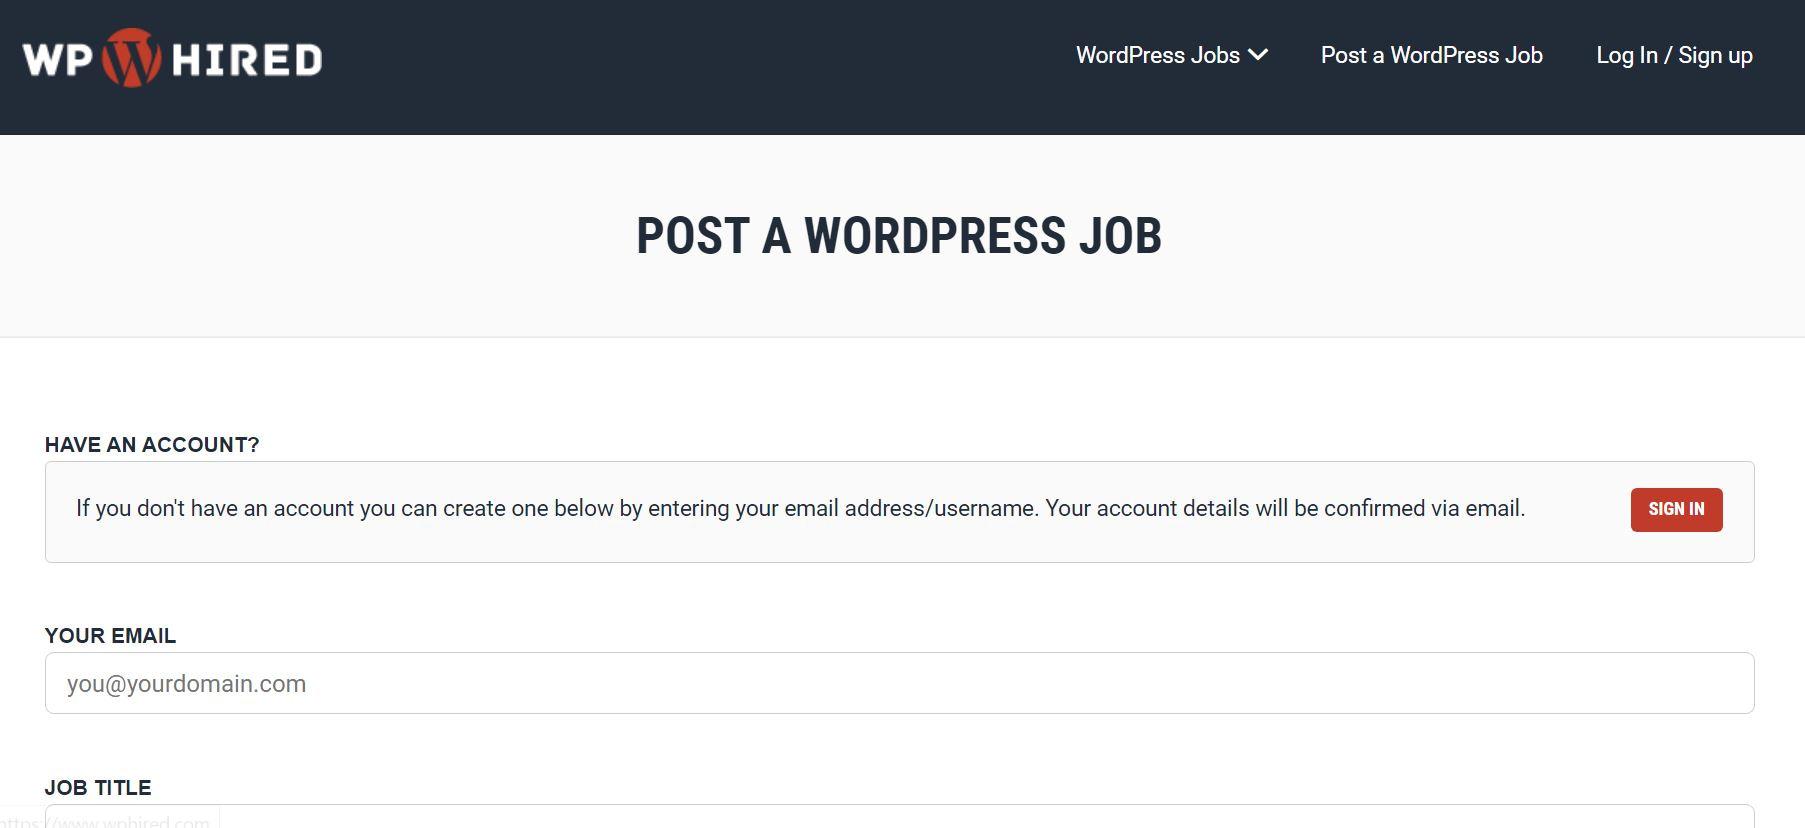 WpHired WordPress jobs